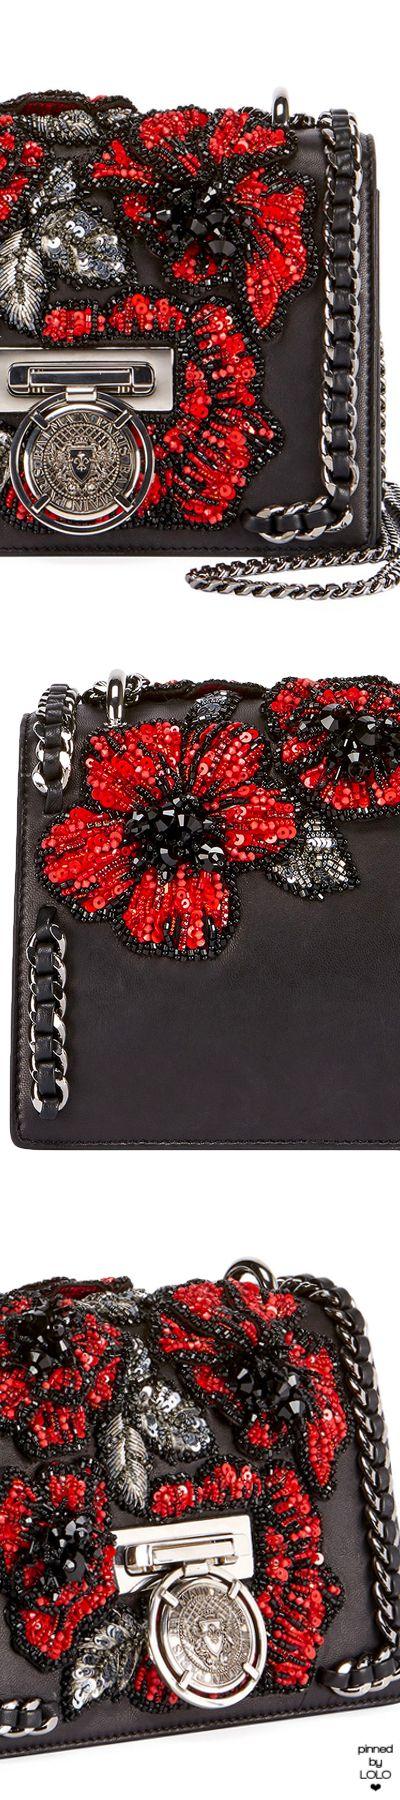 Balmain Leather Flower-Embellished Crossbody Bag